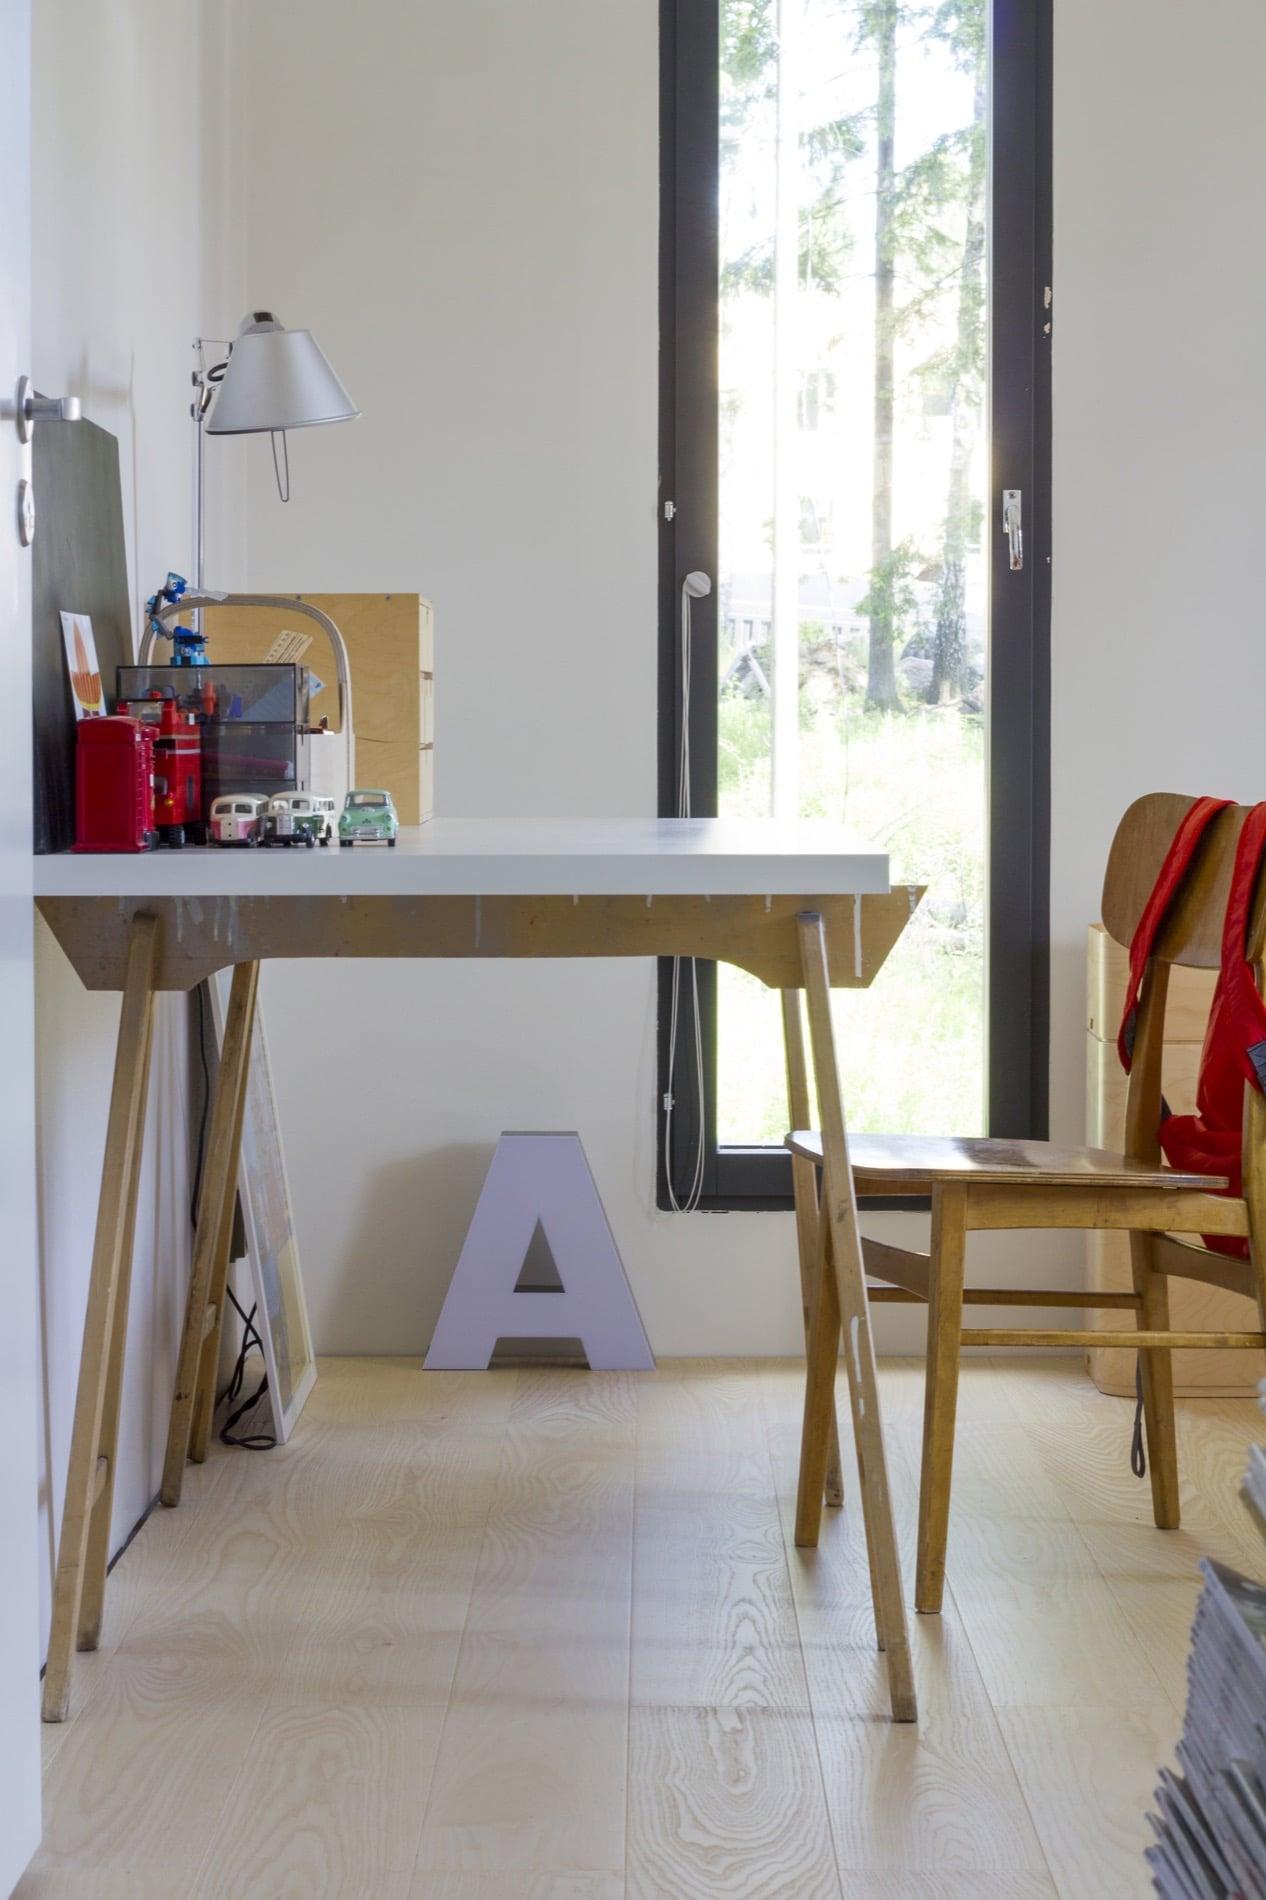 Timberwise parketti puulattia wooden floor parquet Saarni Ash Select îljyvaha wax oil_pysty3